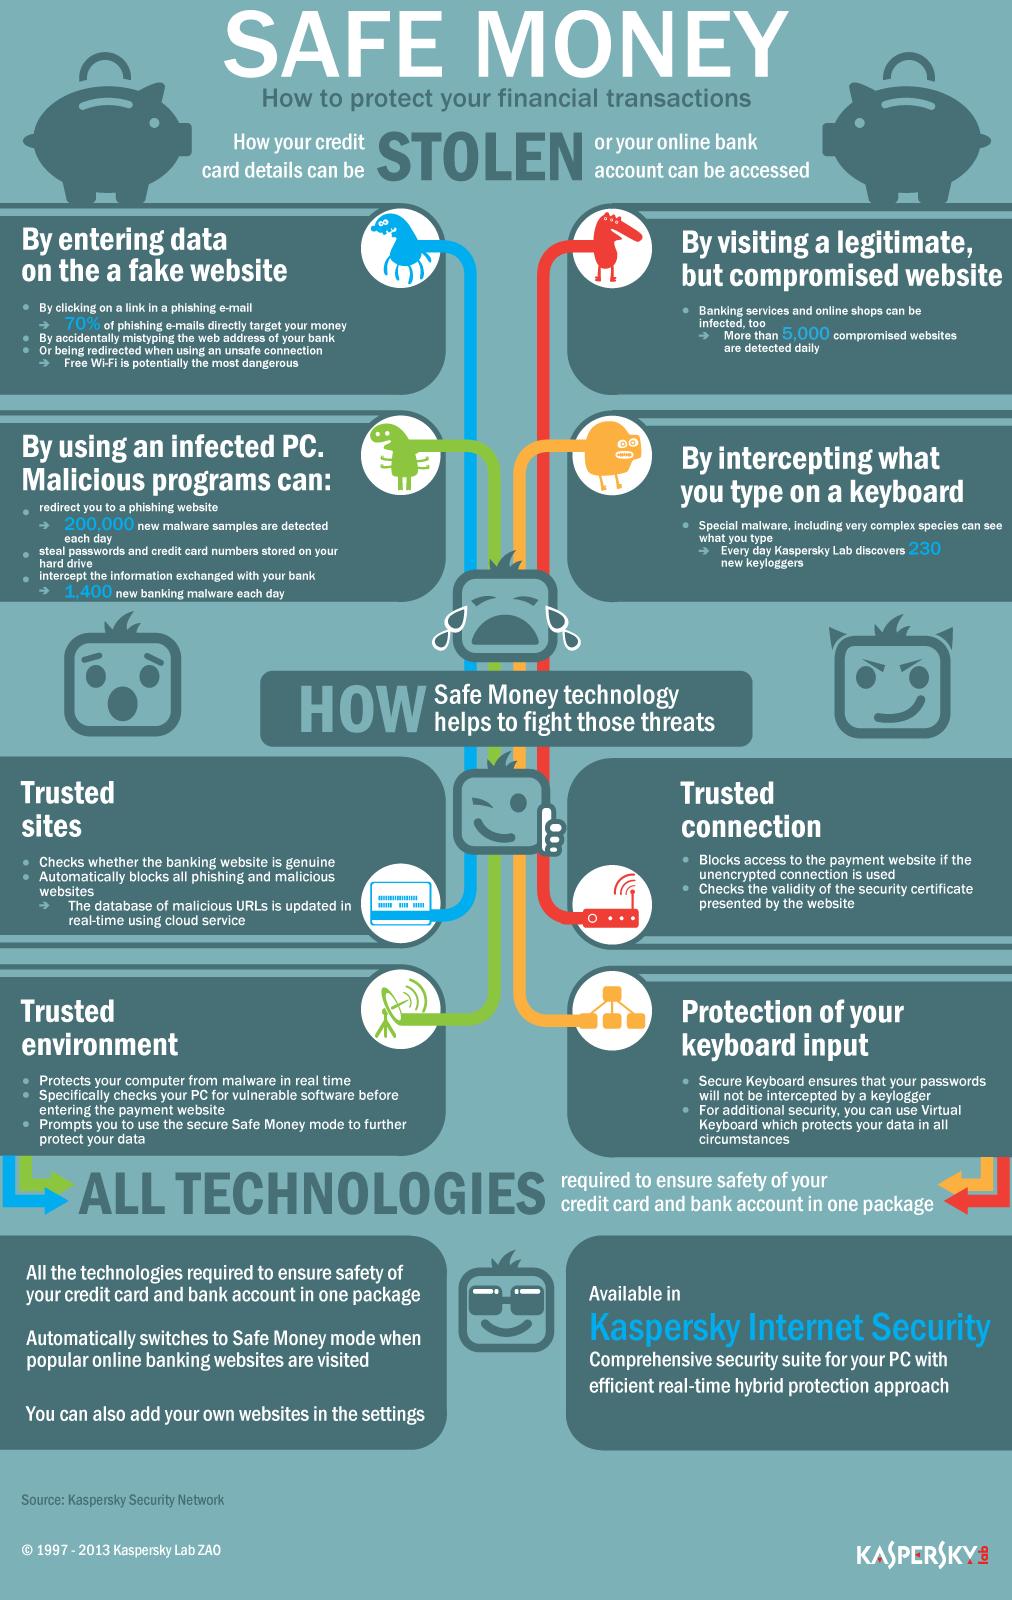 Kaspersky's Safe Money: Secure Your Online Transactions #infographic